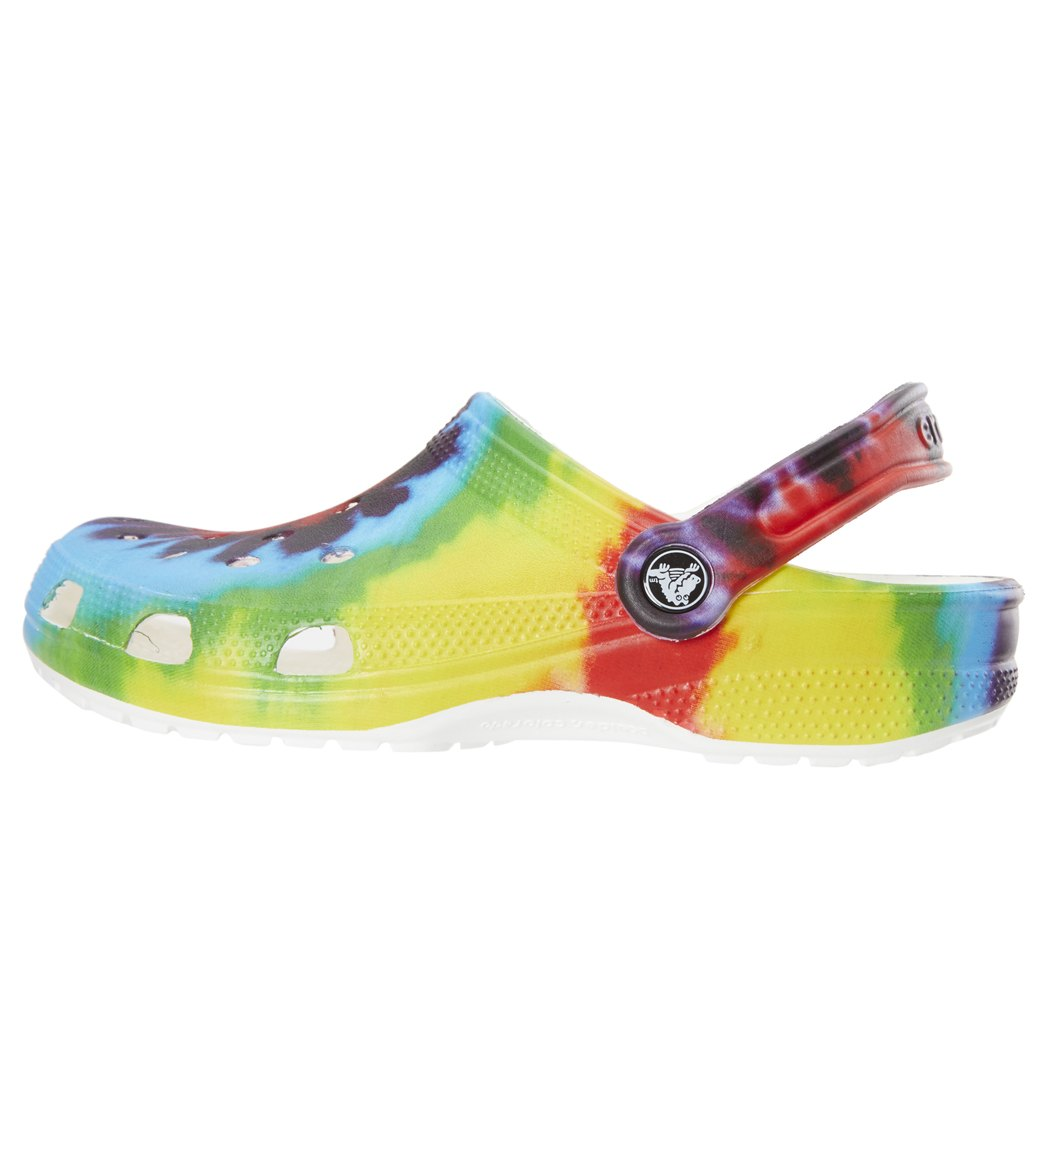 8c8732789138e Crocs Classic Tie Dye Graphic Clog at SwimOutlet.com